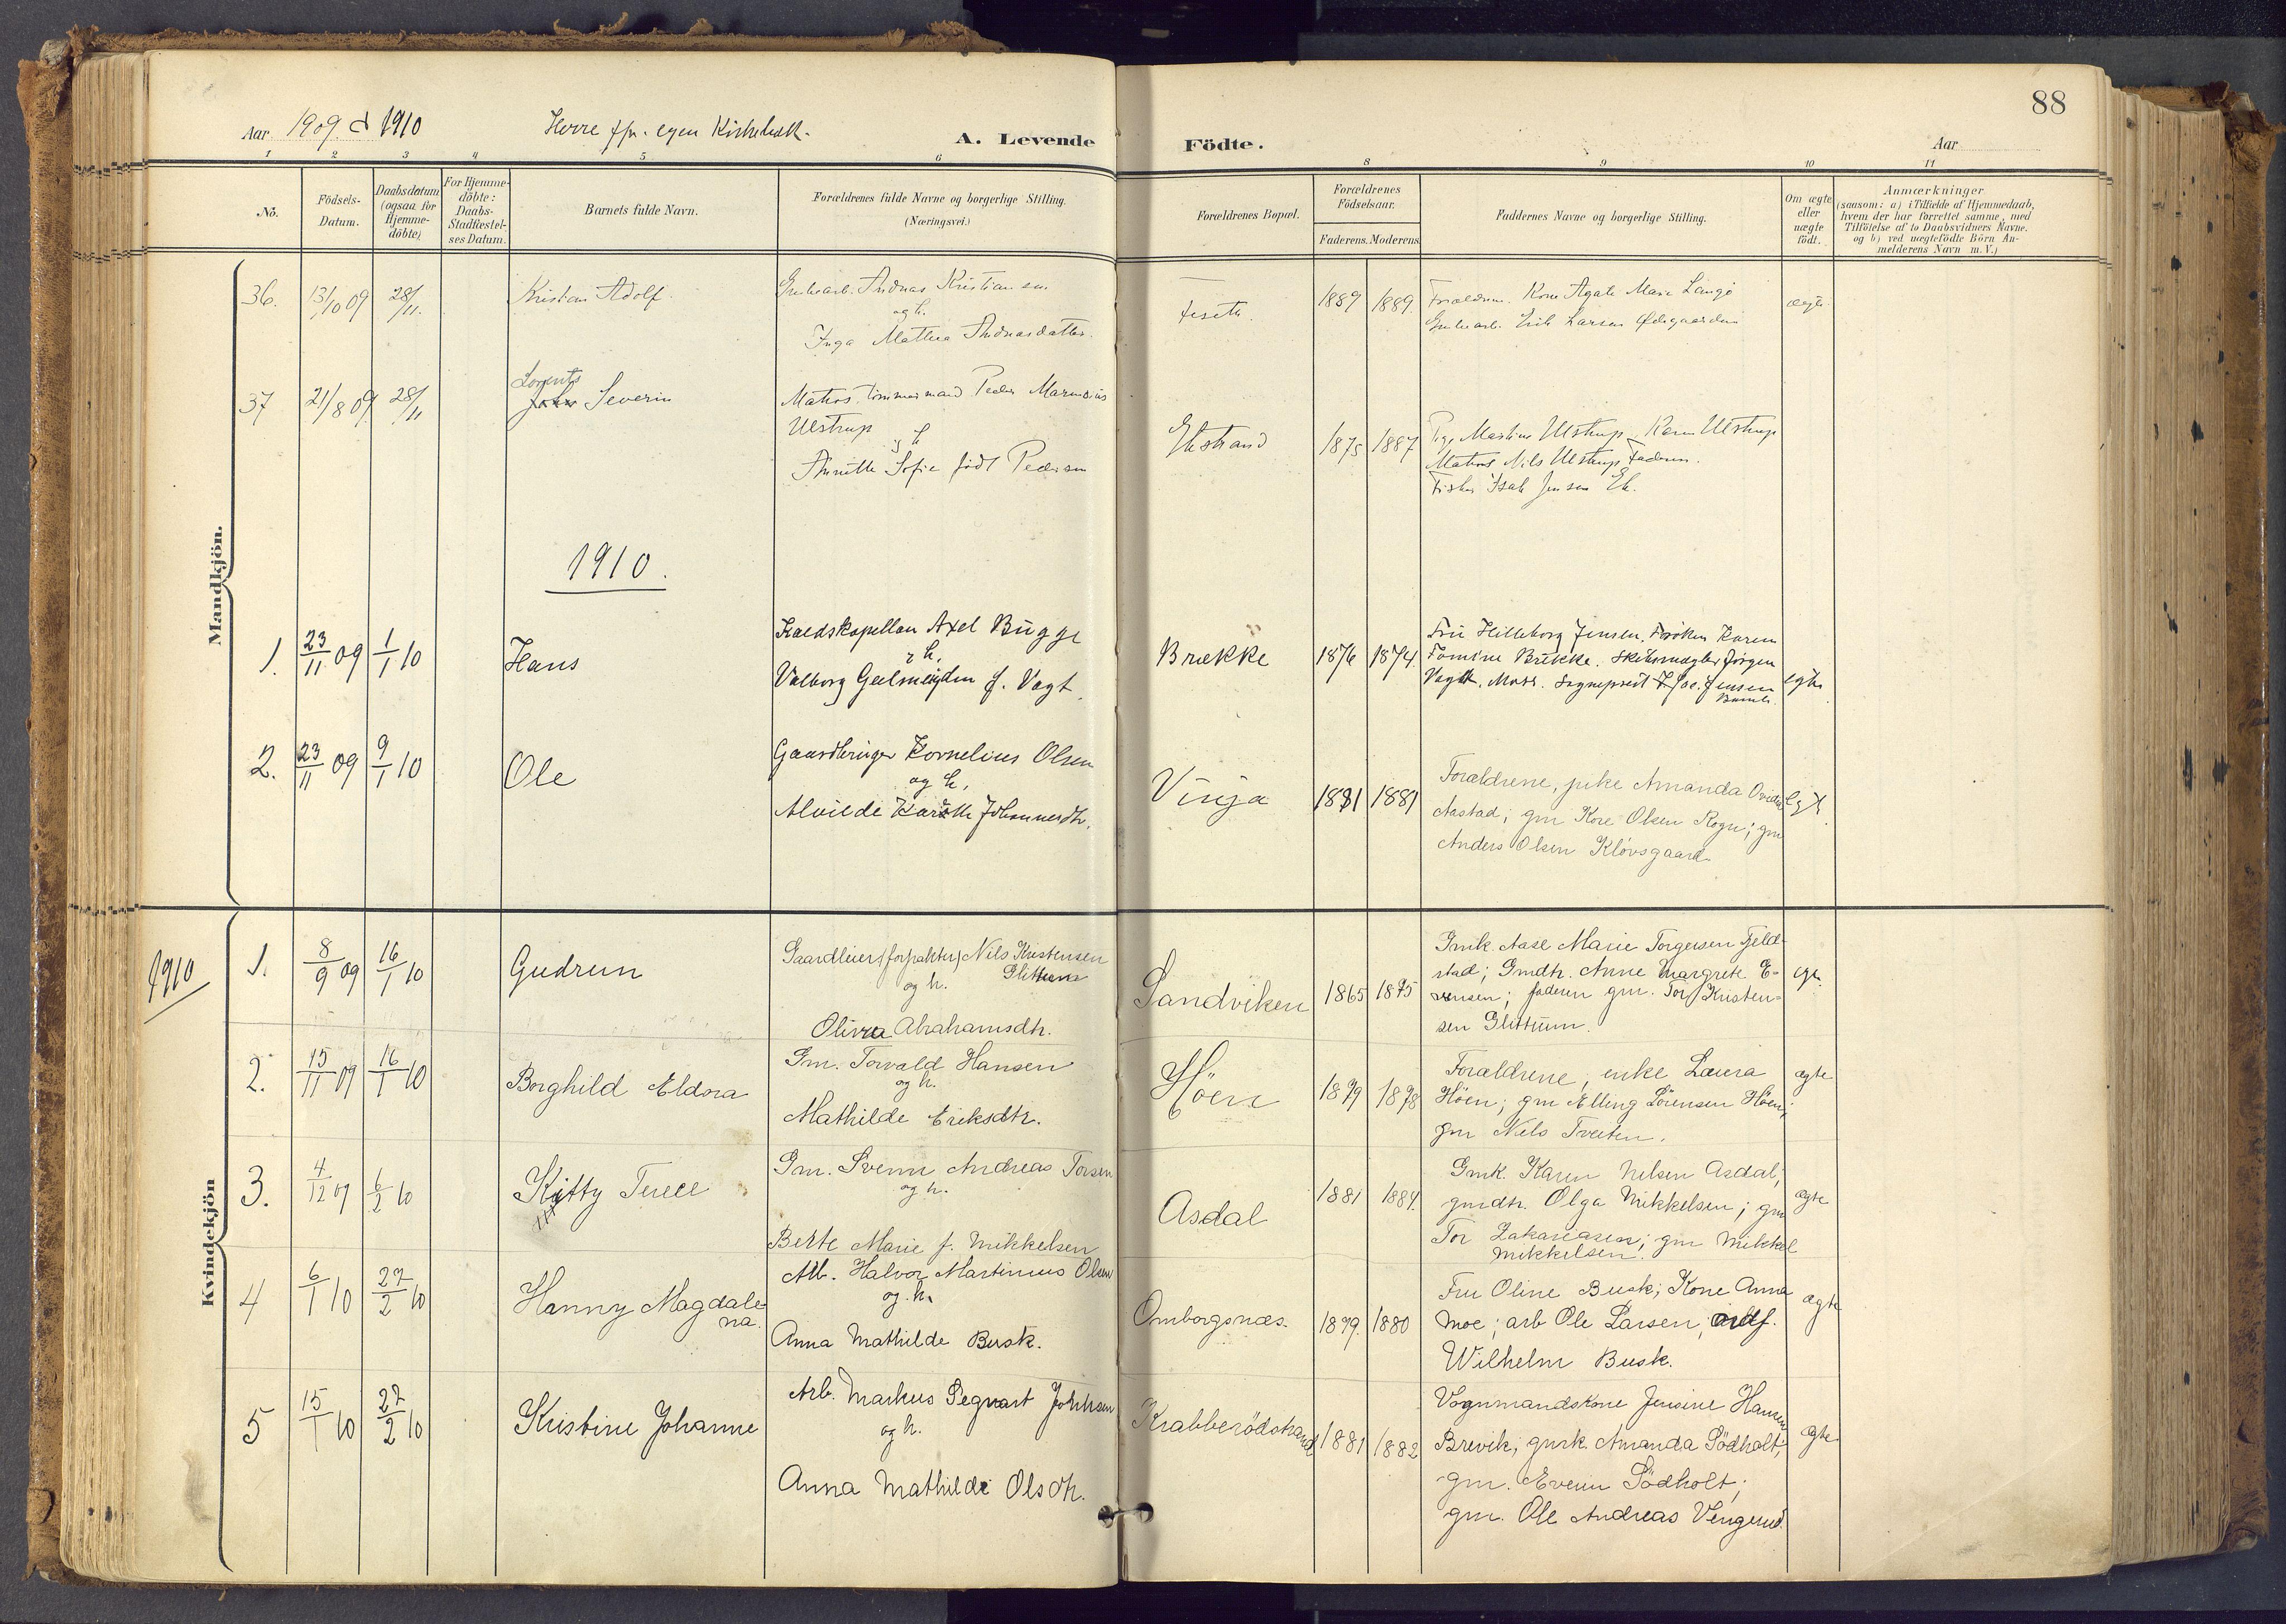 SAKO, Bamble kirkebøker, F/Fa/L0009: Ministerialbok nr. I 9, 1901-1917, s. 88